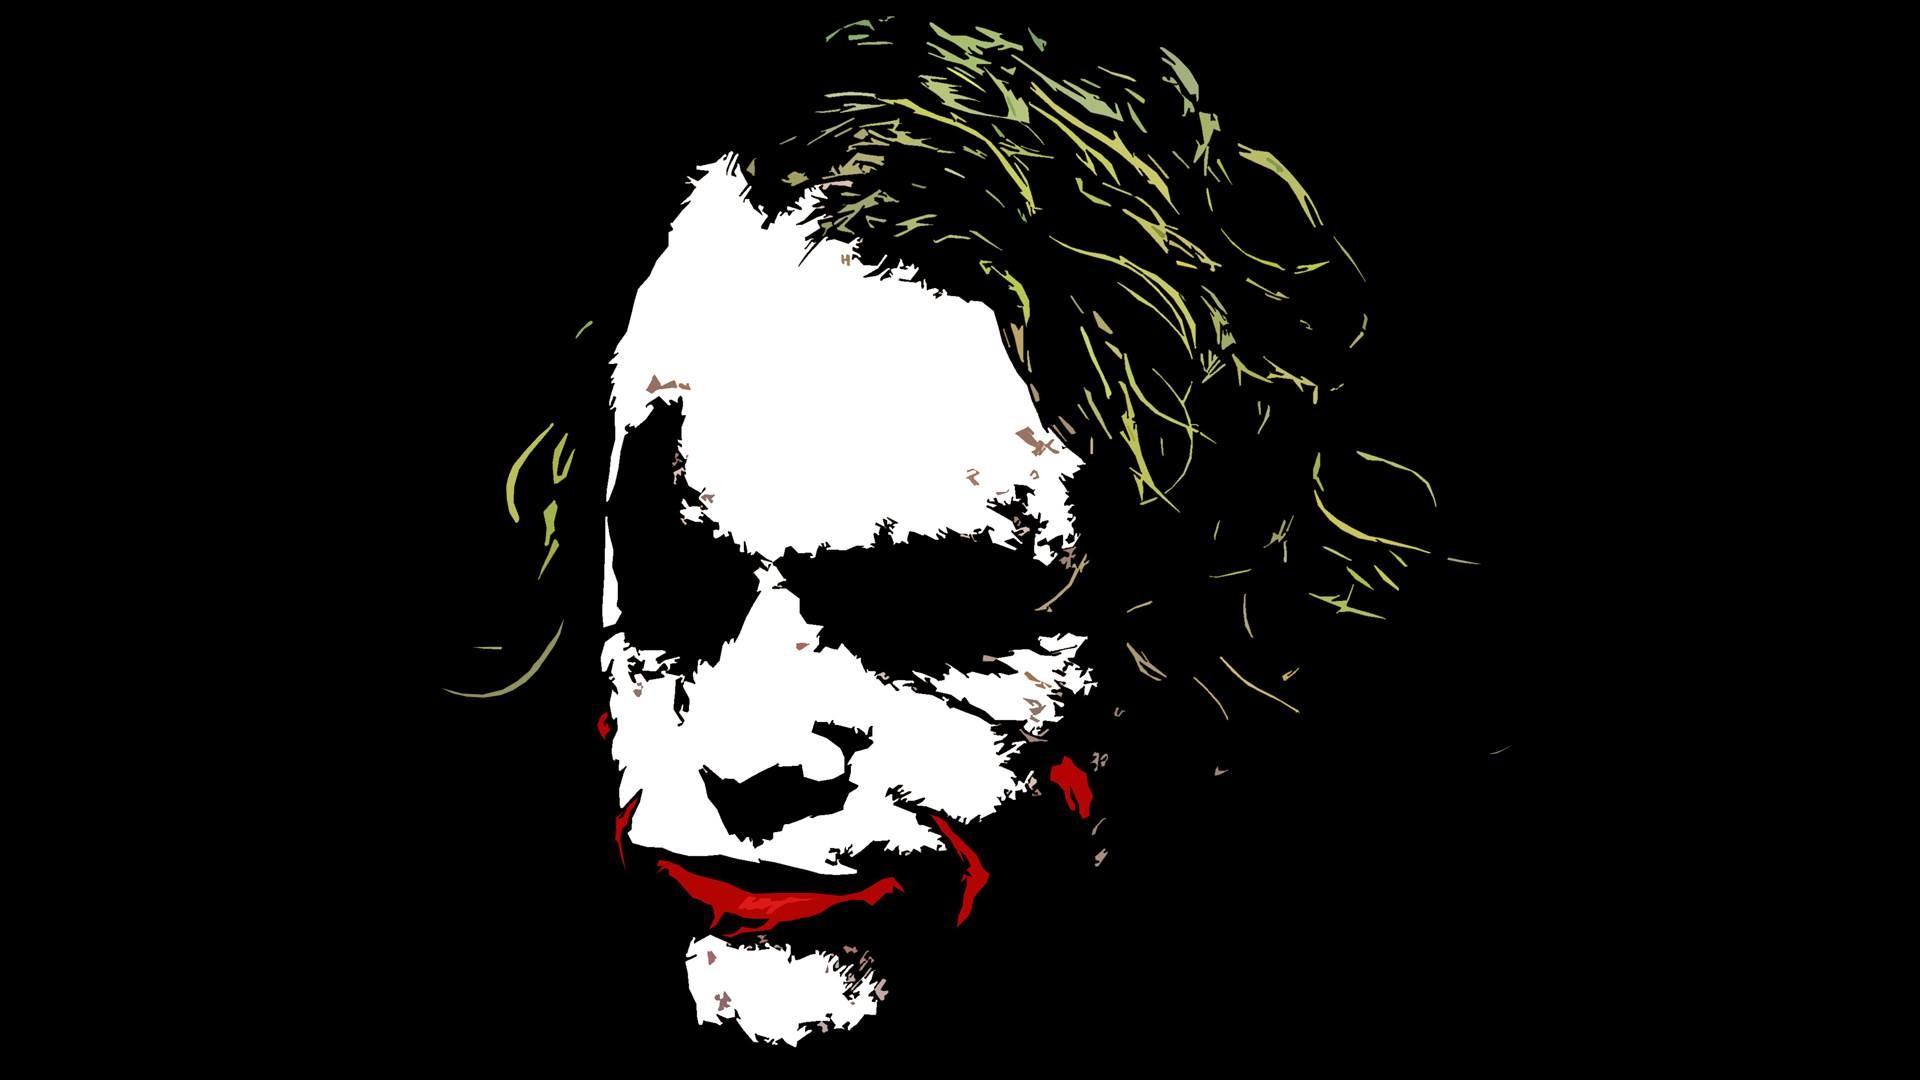 Joker HD Wallpapers Backgrounds Wallpaper 1920×1080 Joker Images | Adorable  Wallpapers